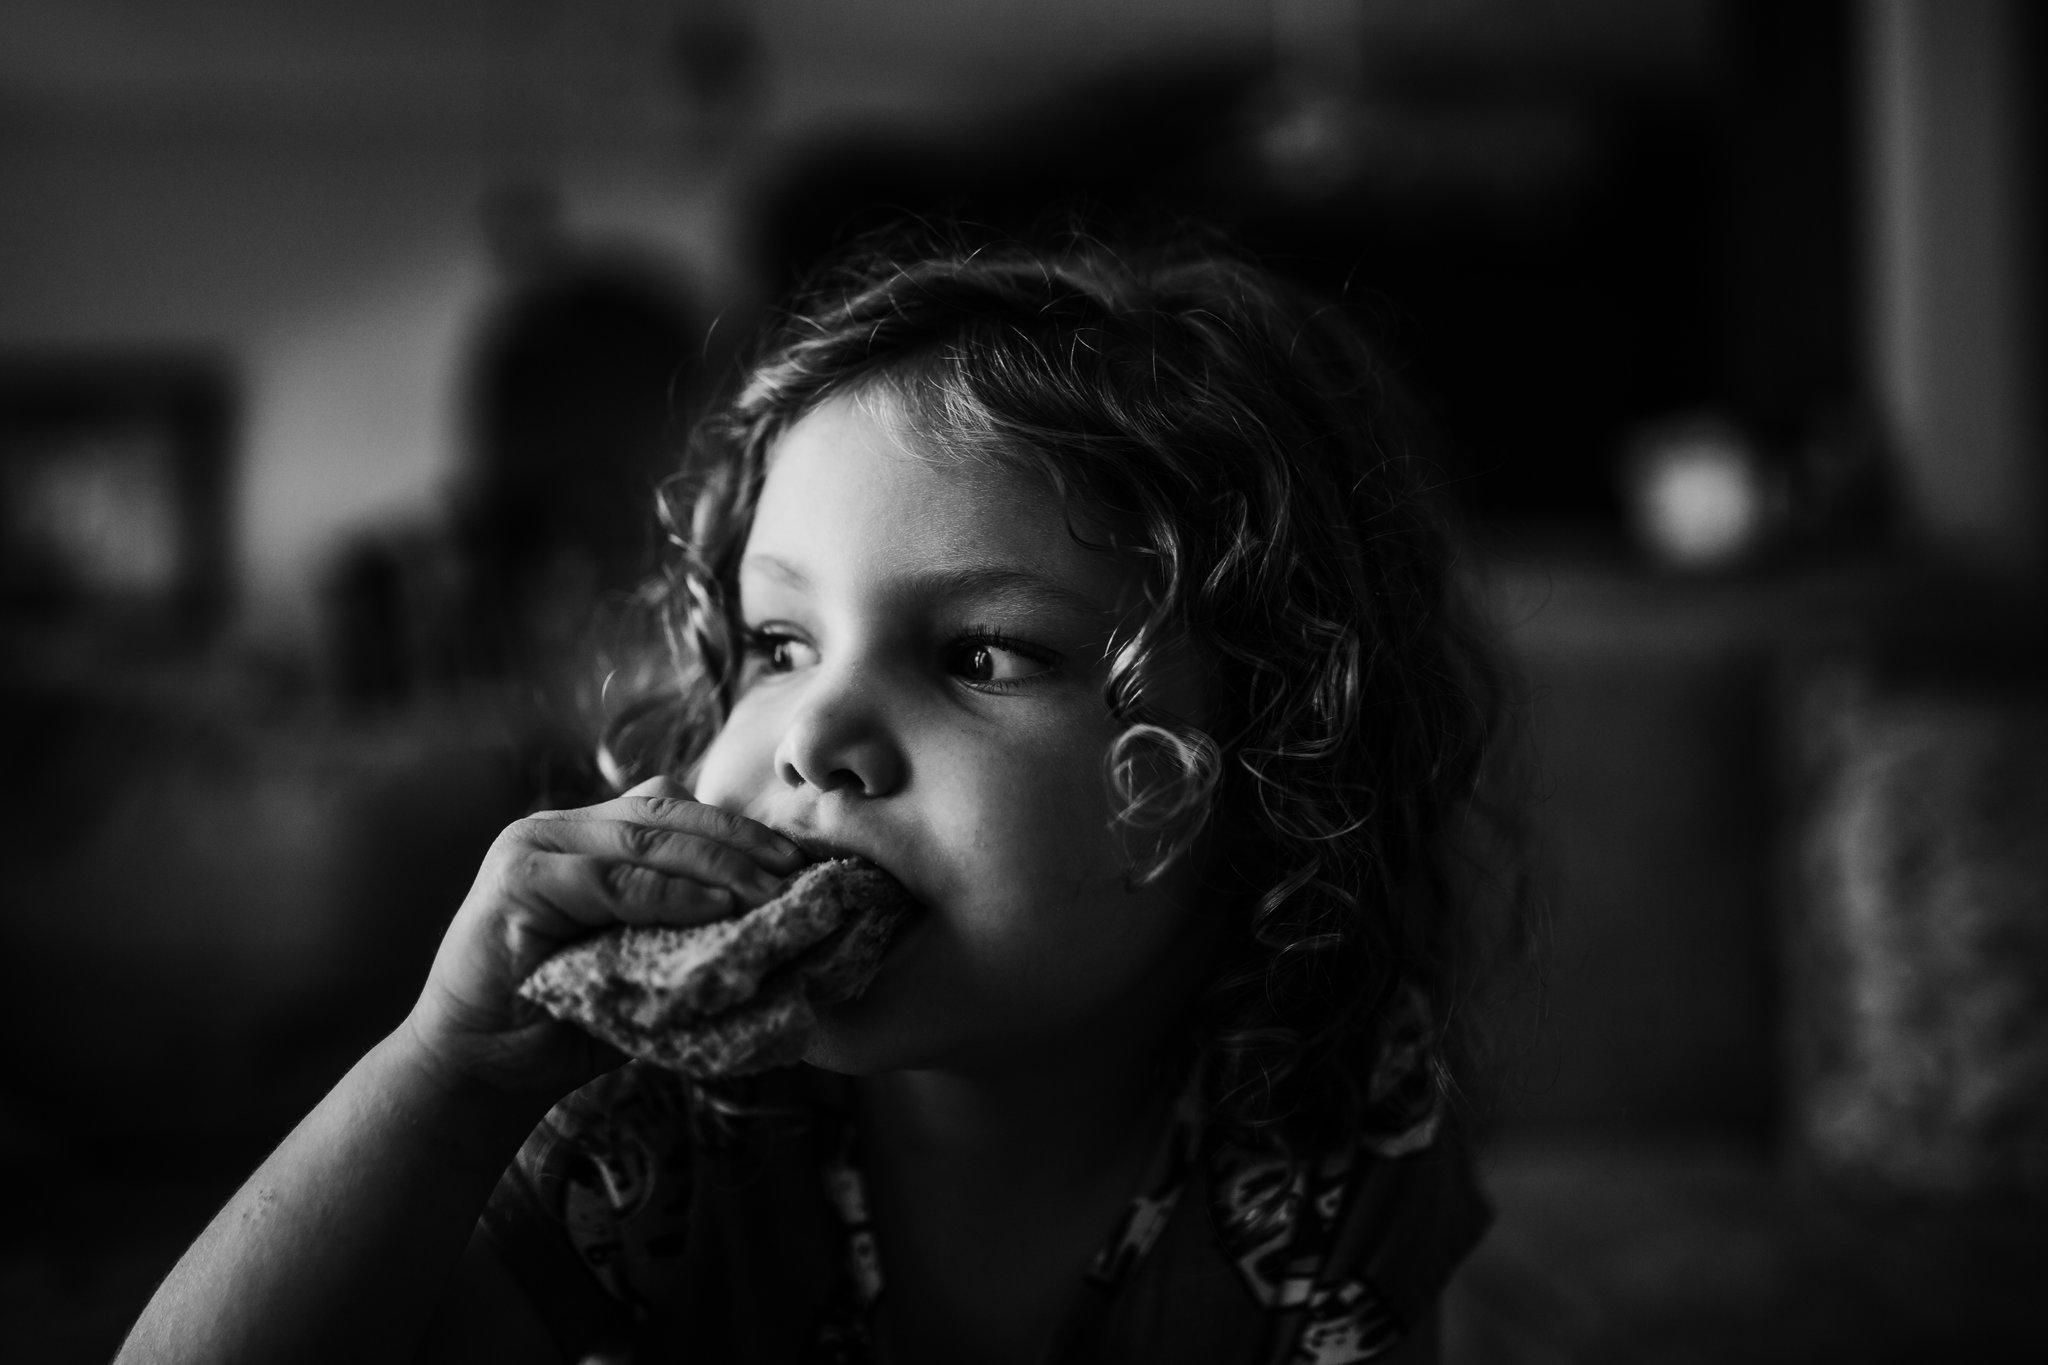 Little girl eats peanut butter and jelly sandwich